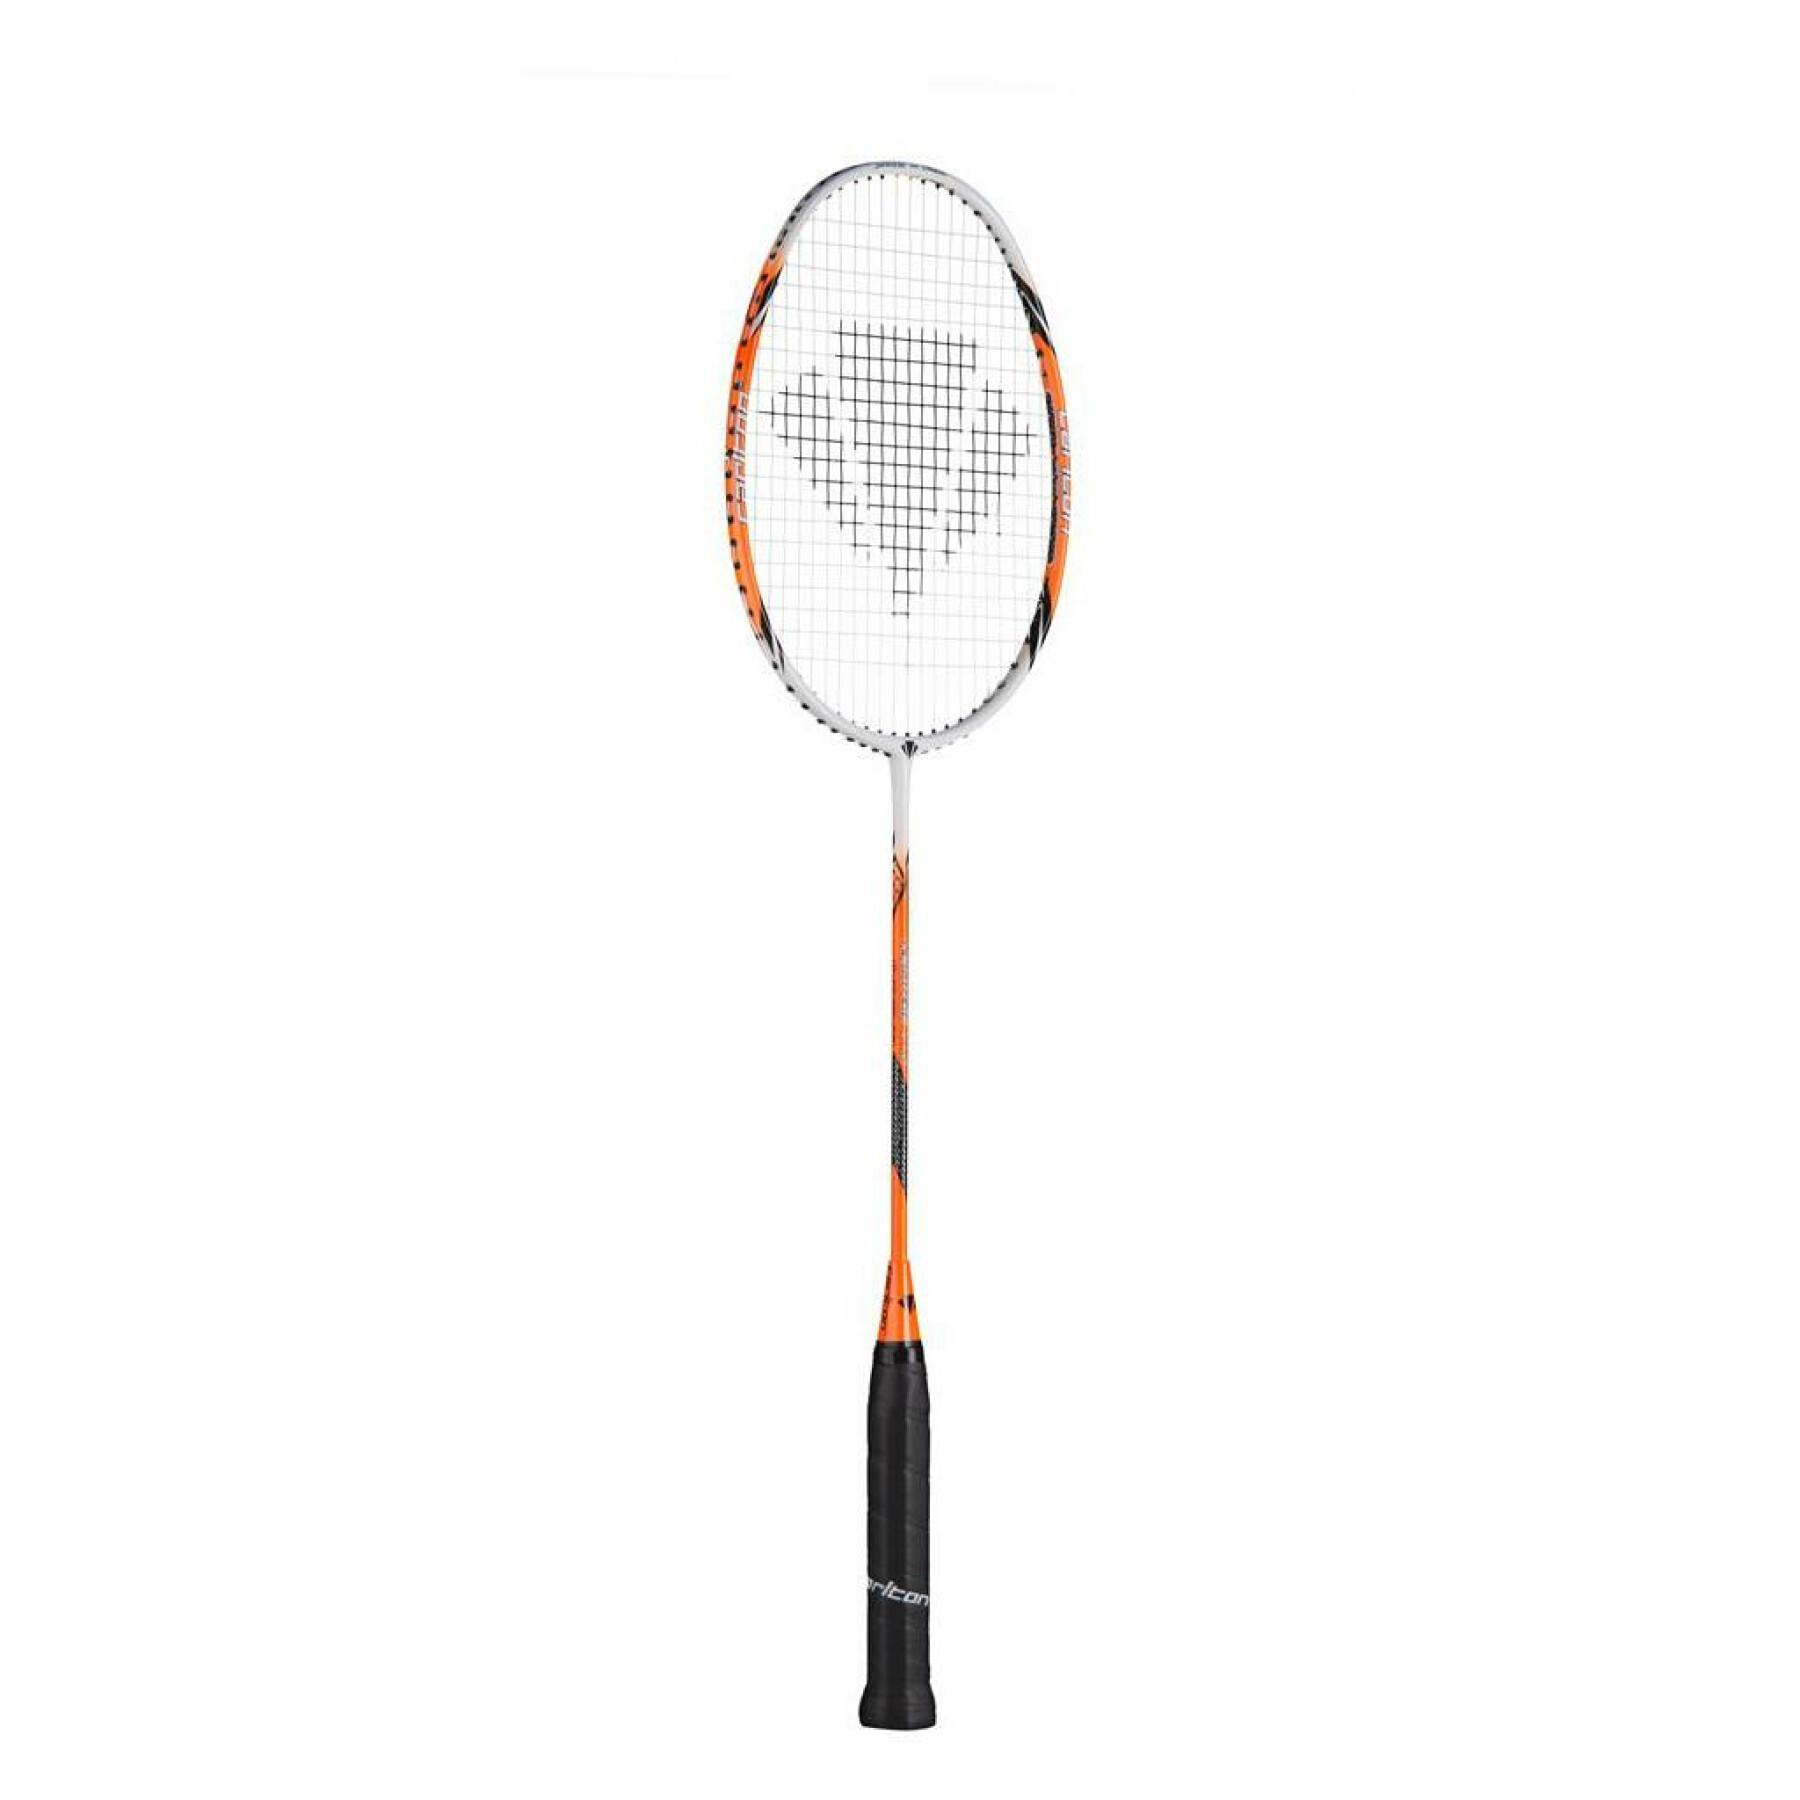 Racket Carlton c br heritage v1.0 g4 hq